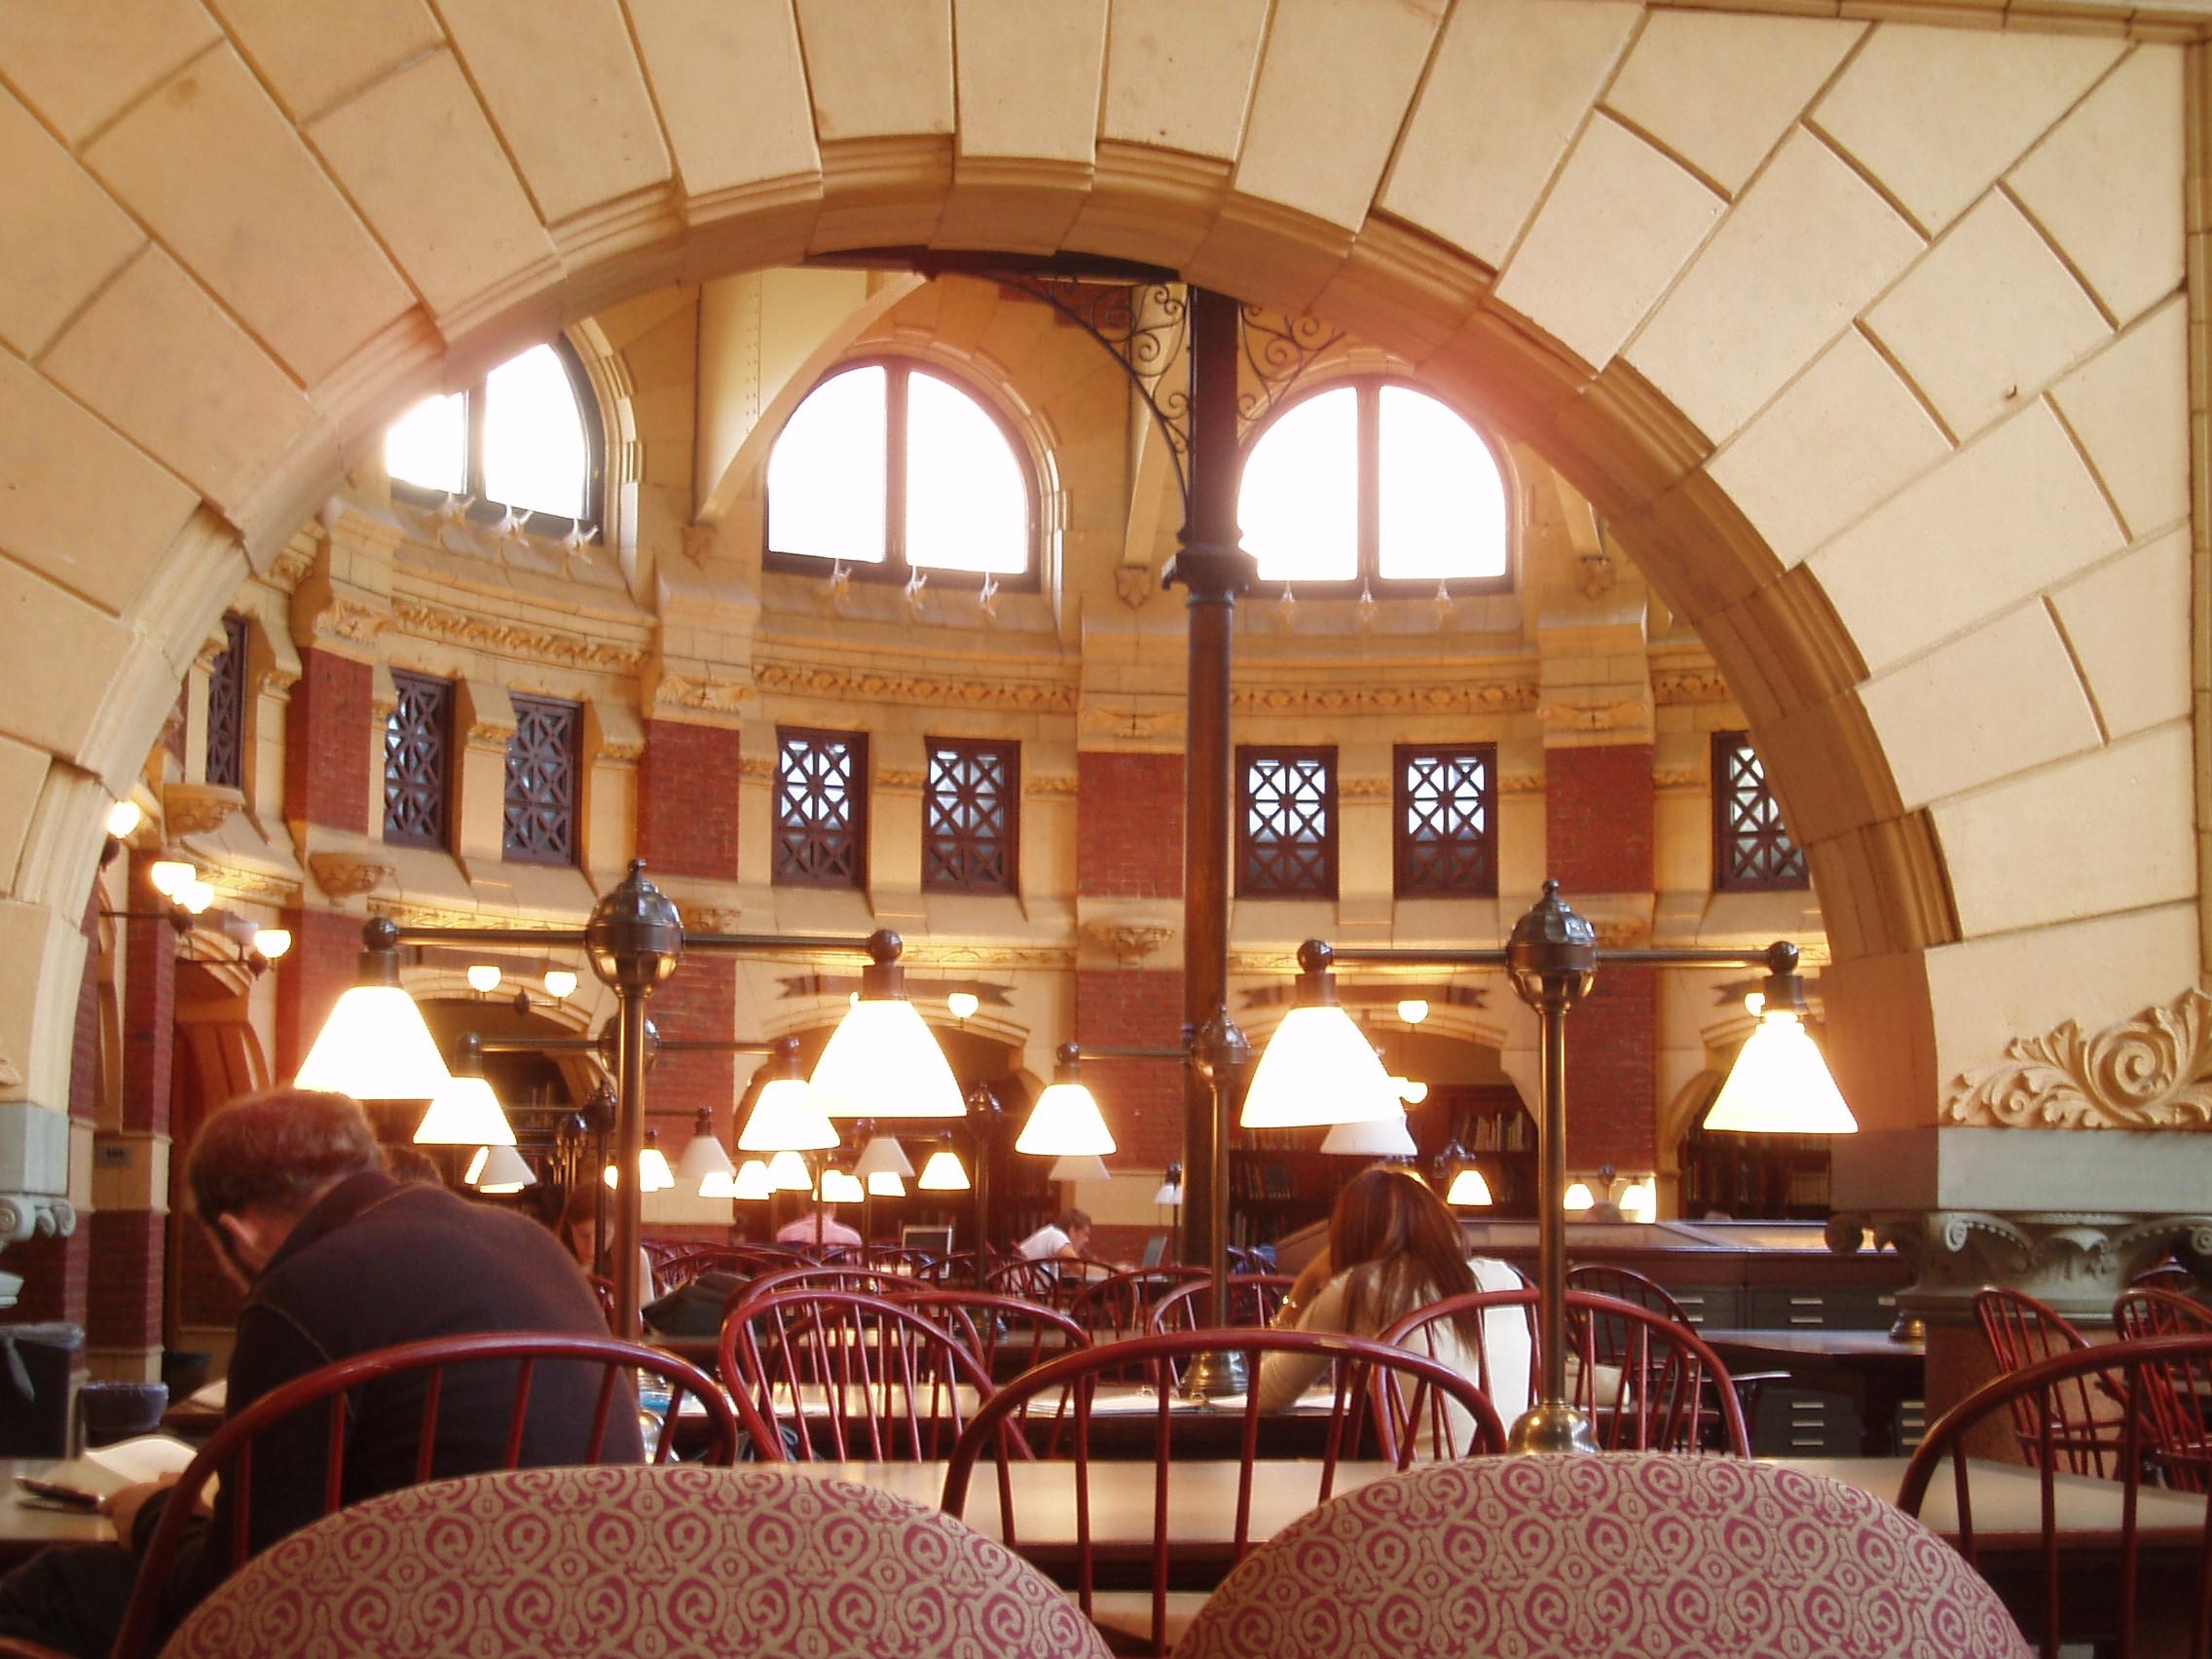 Penn Fine Arts Library File:upenn Fine Arts Library